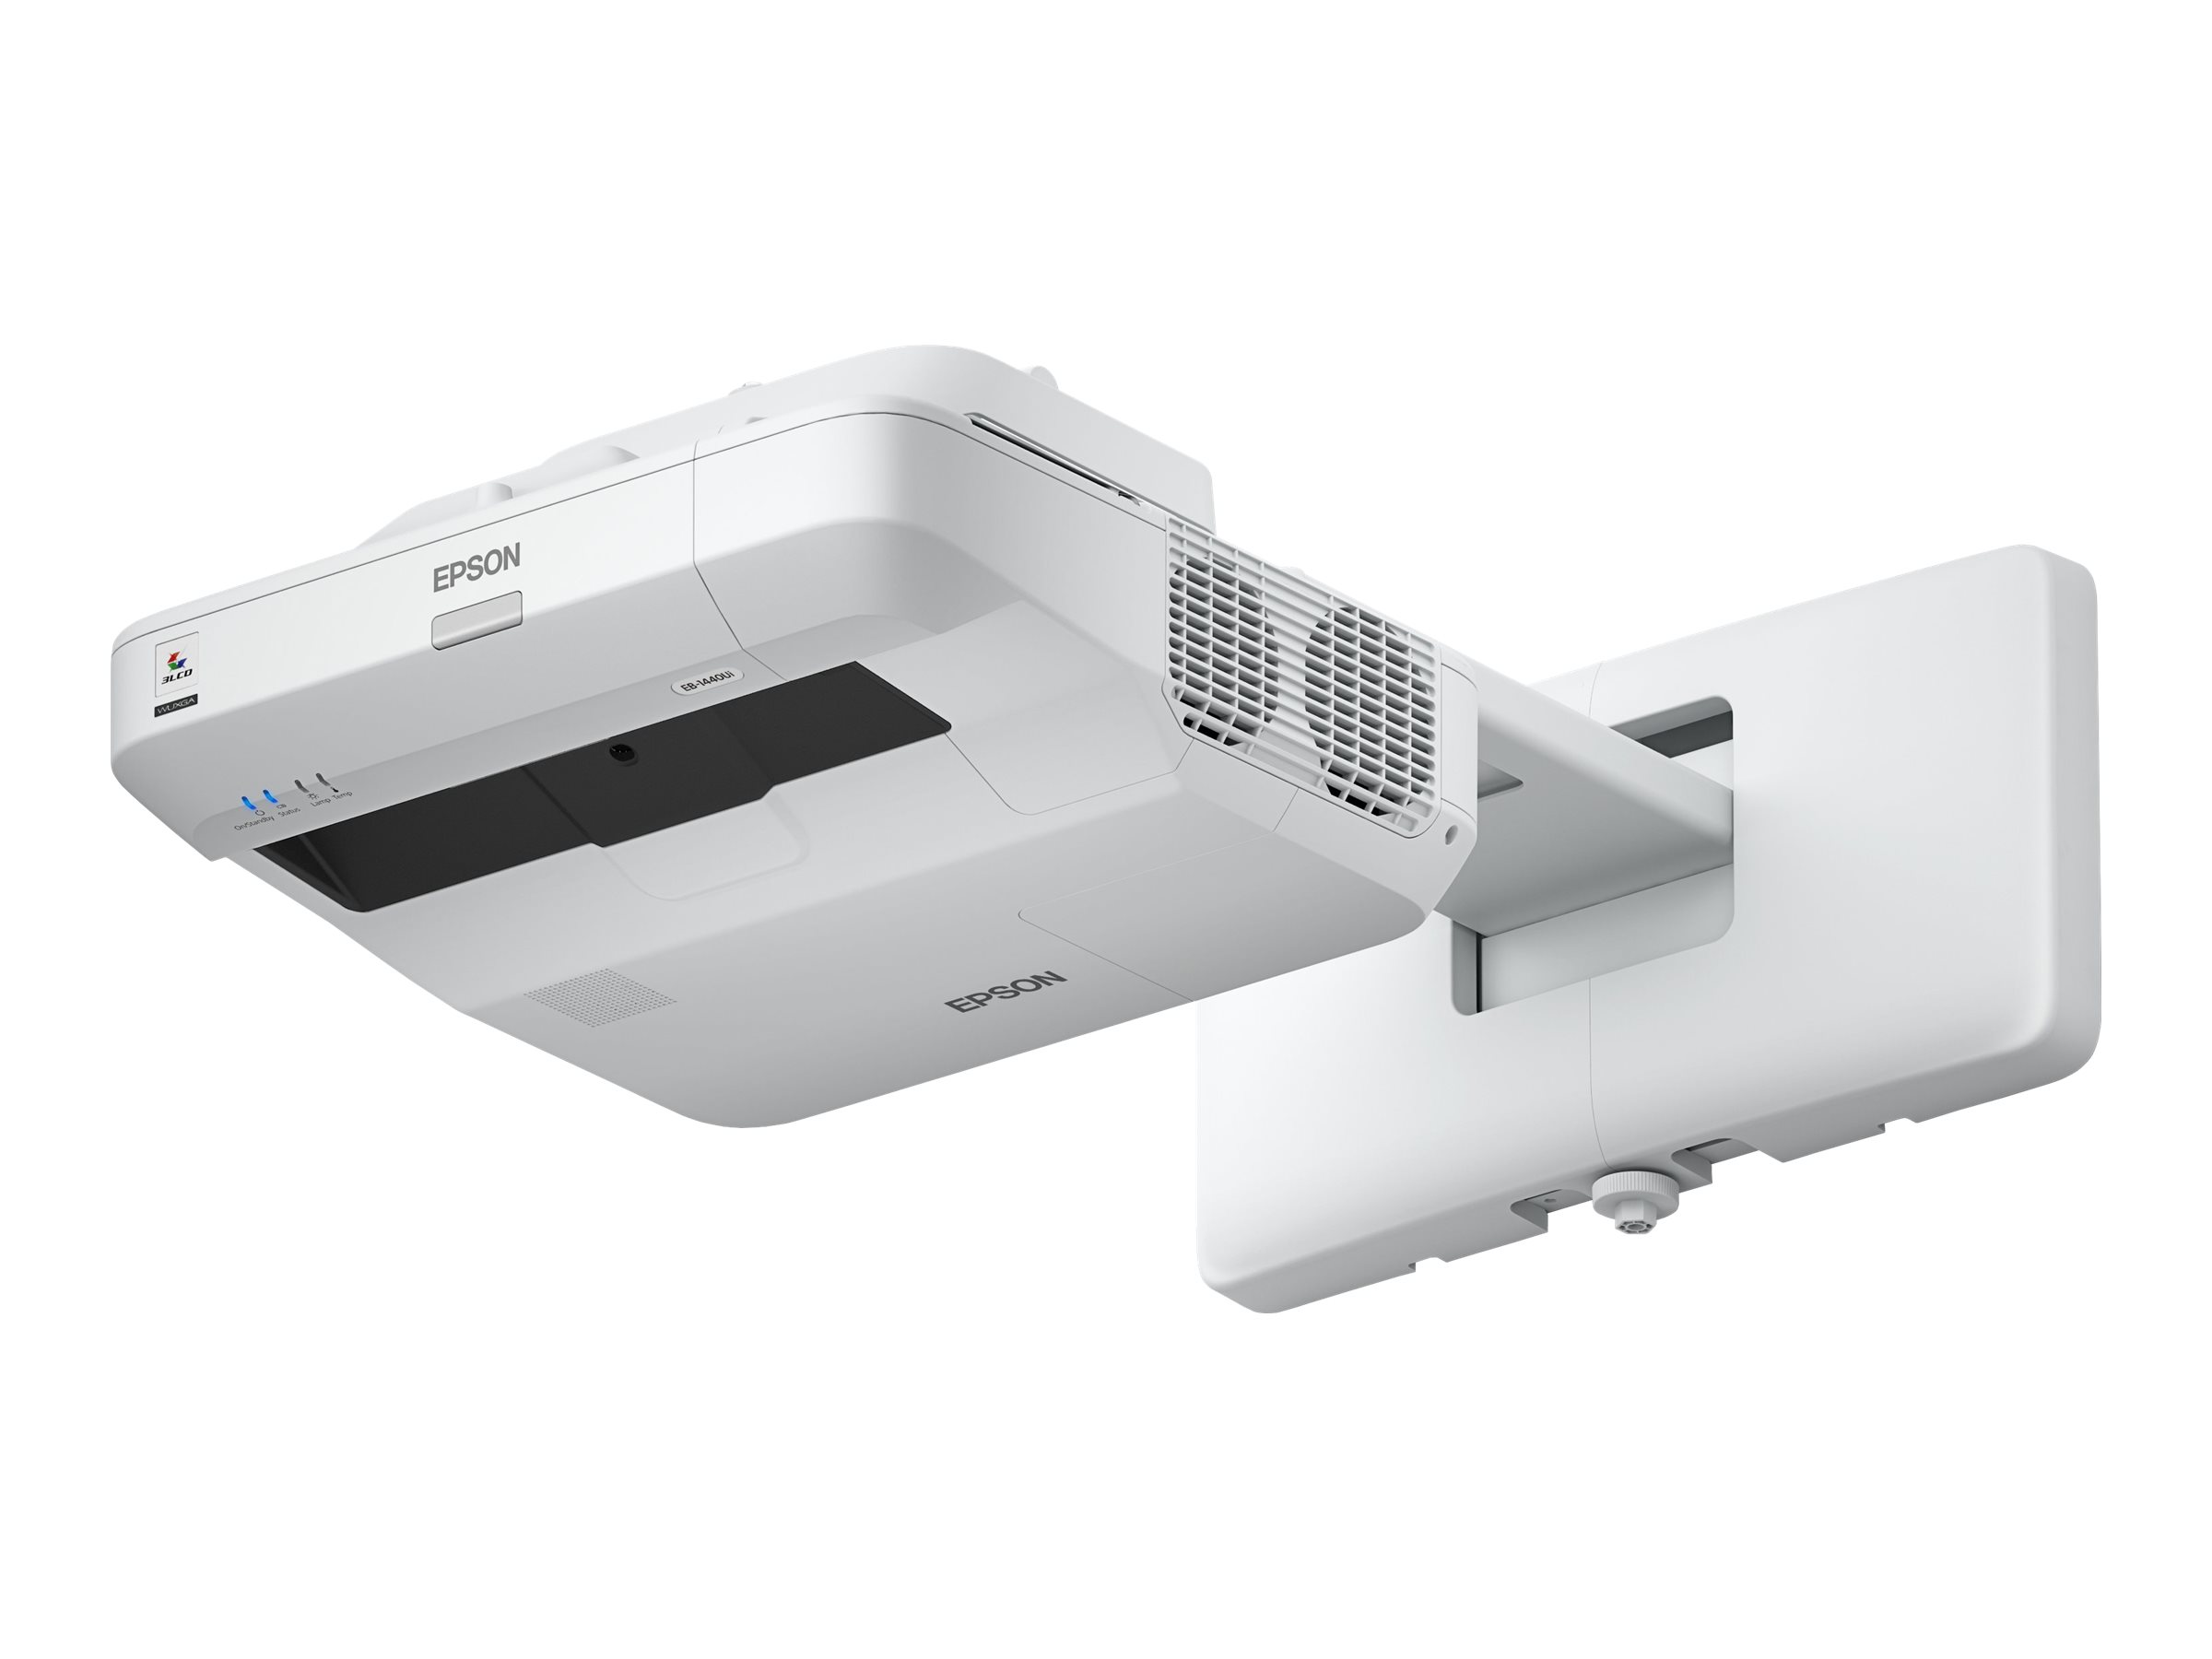 Epson EB-1440Ui - 3-LCD-Projektor - 3800 lm (weiss) - 3800 lm (Farbe) - WUXGA (1920 x 1200) - 16:10